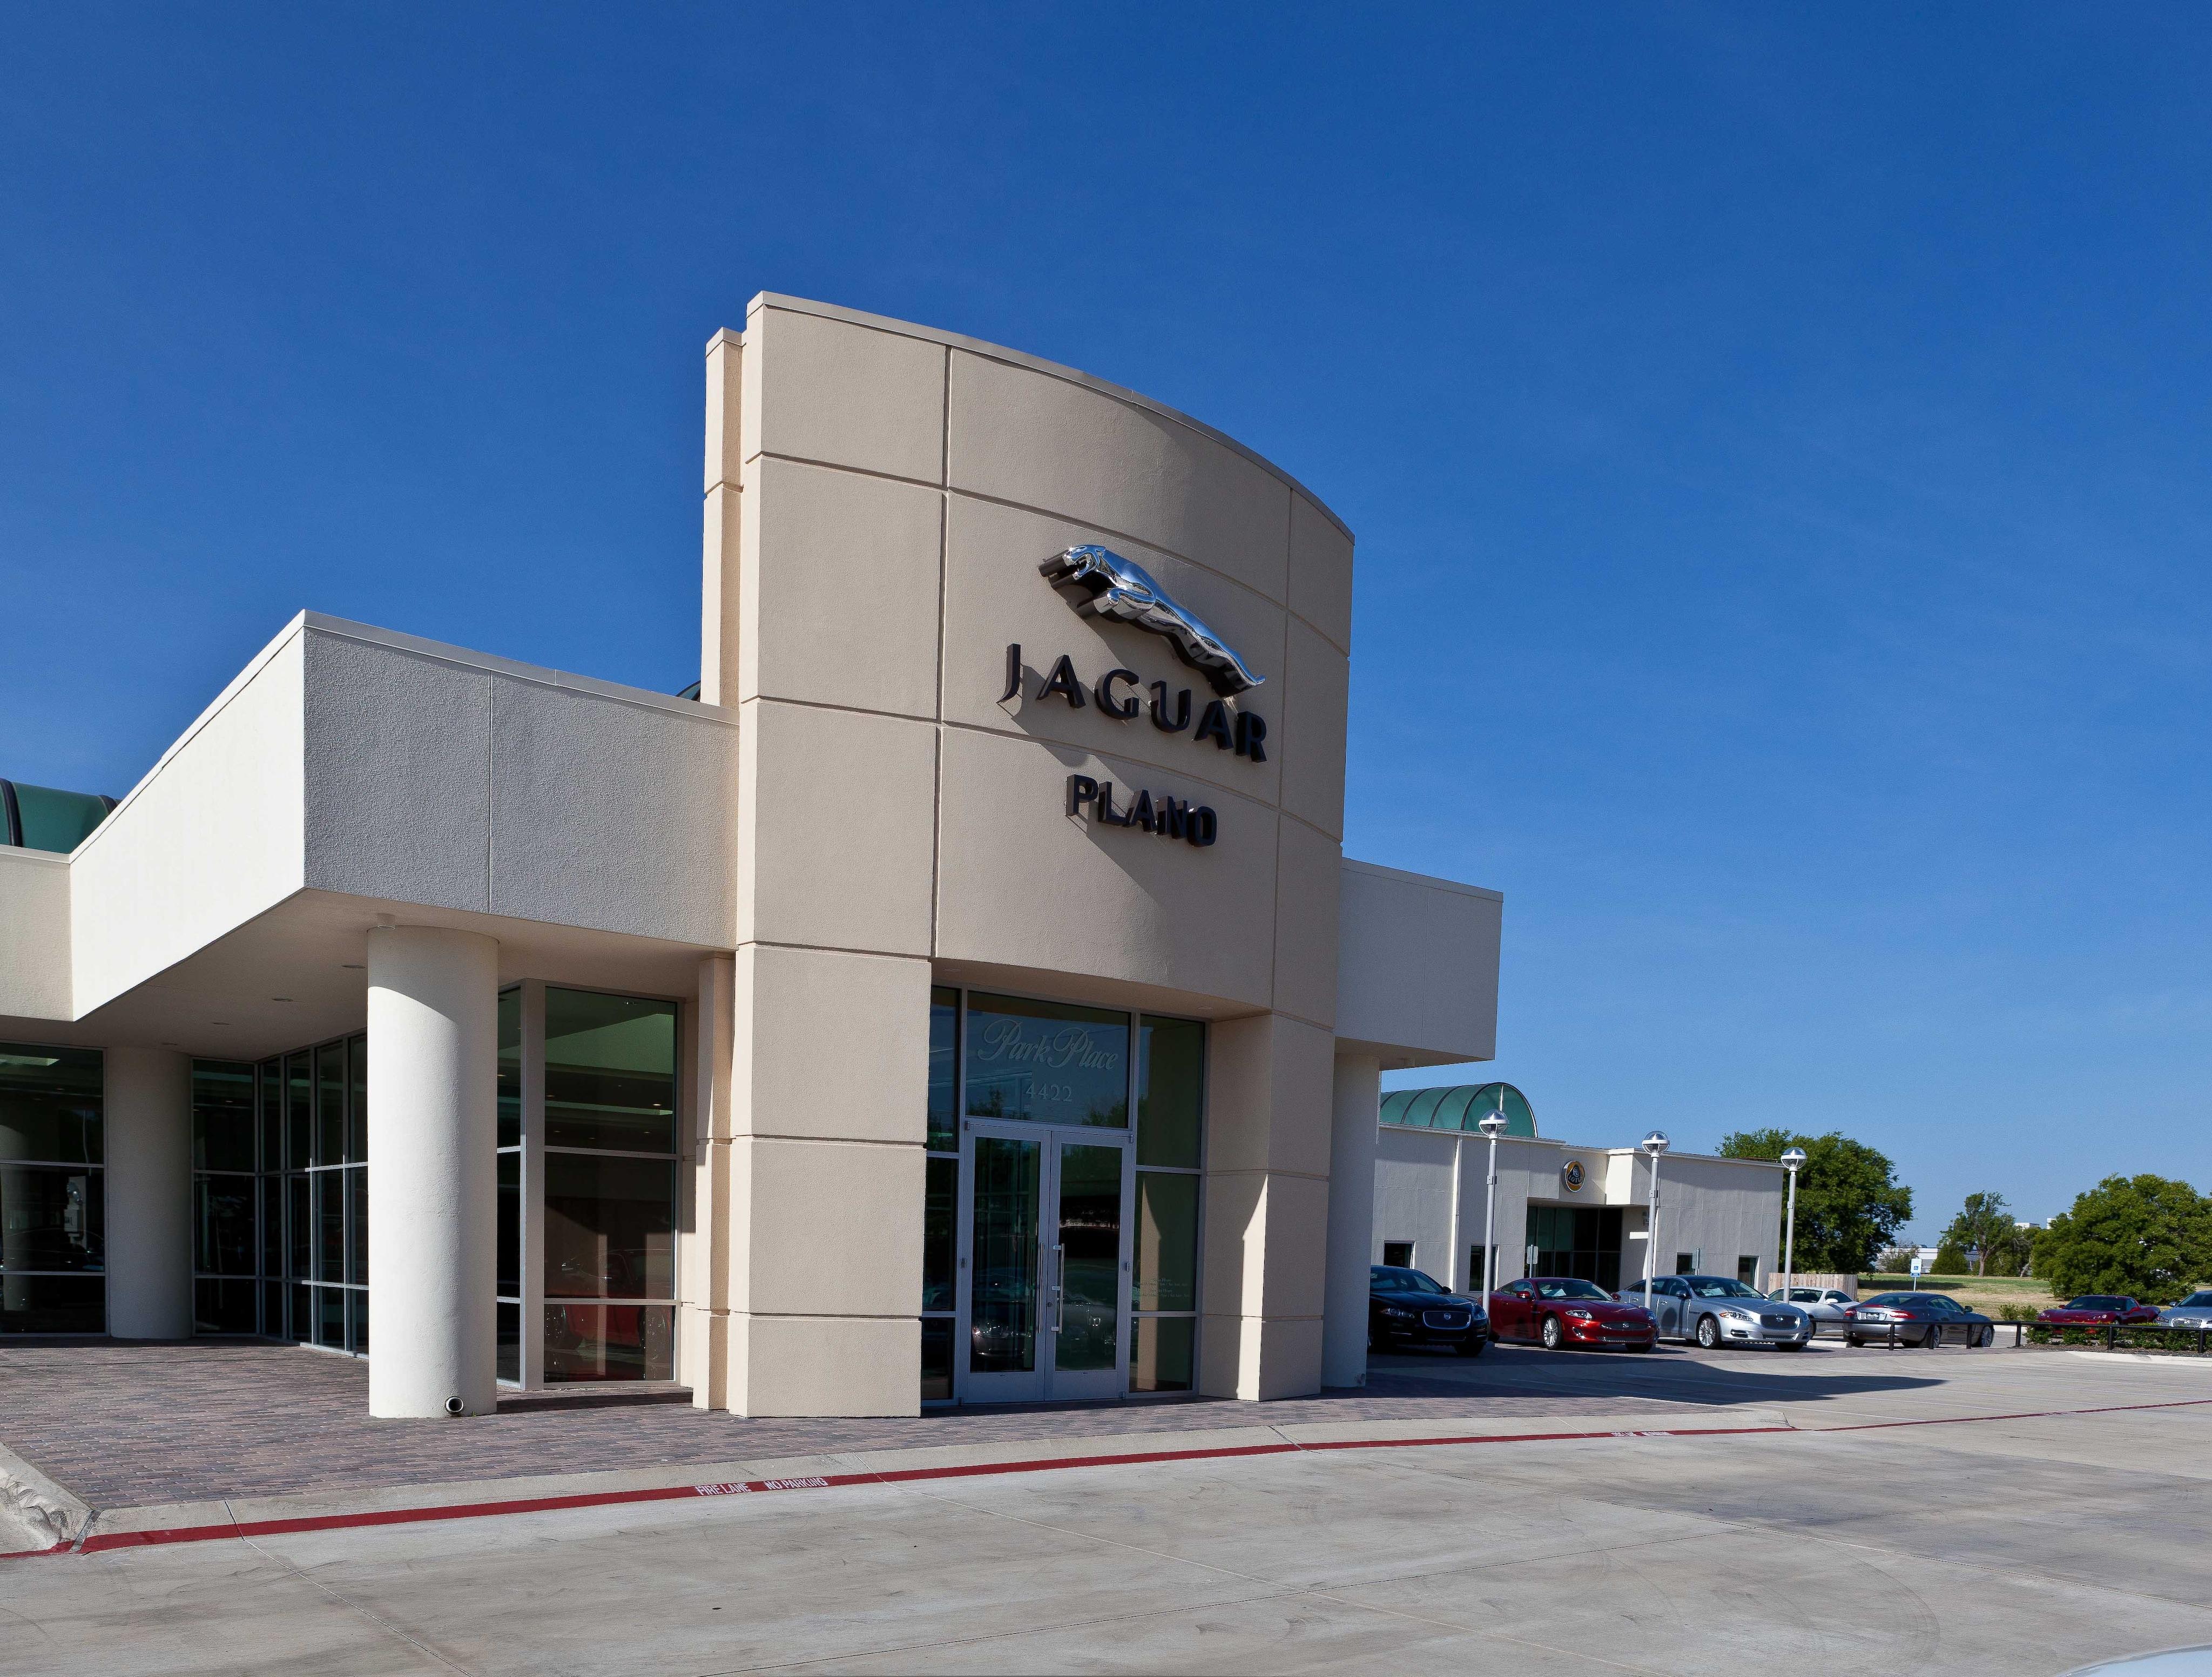 Jaguar DFW | New Jaguar Dealership In DFW Airport, TX 75261